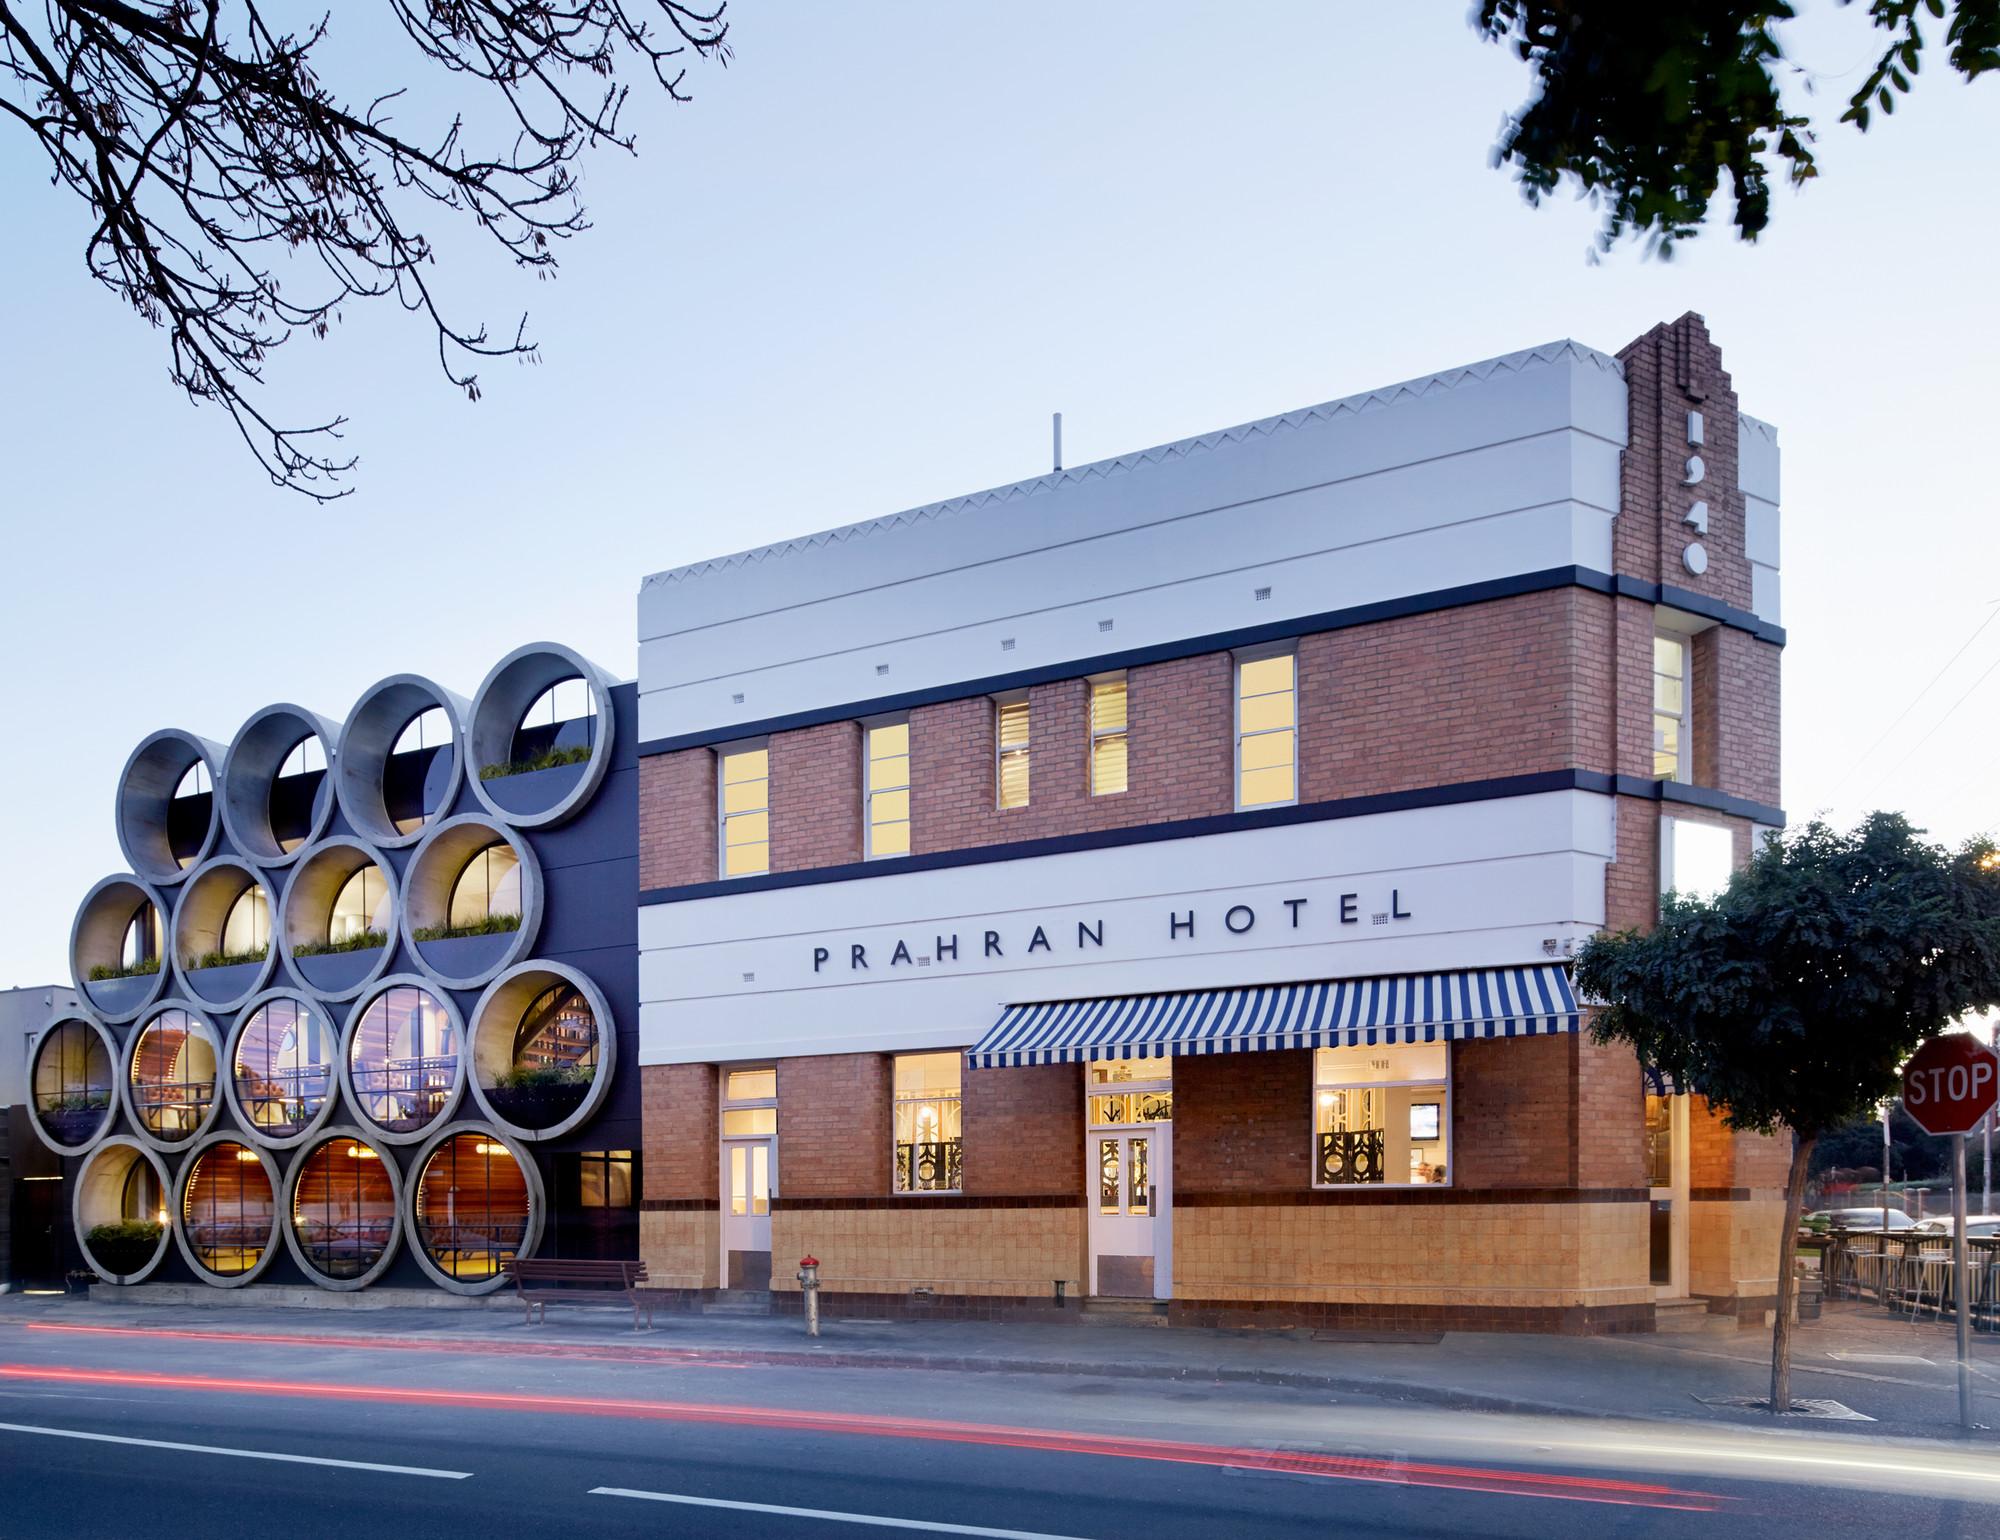 Image courtesy of australian institute of architects